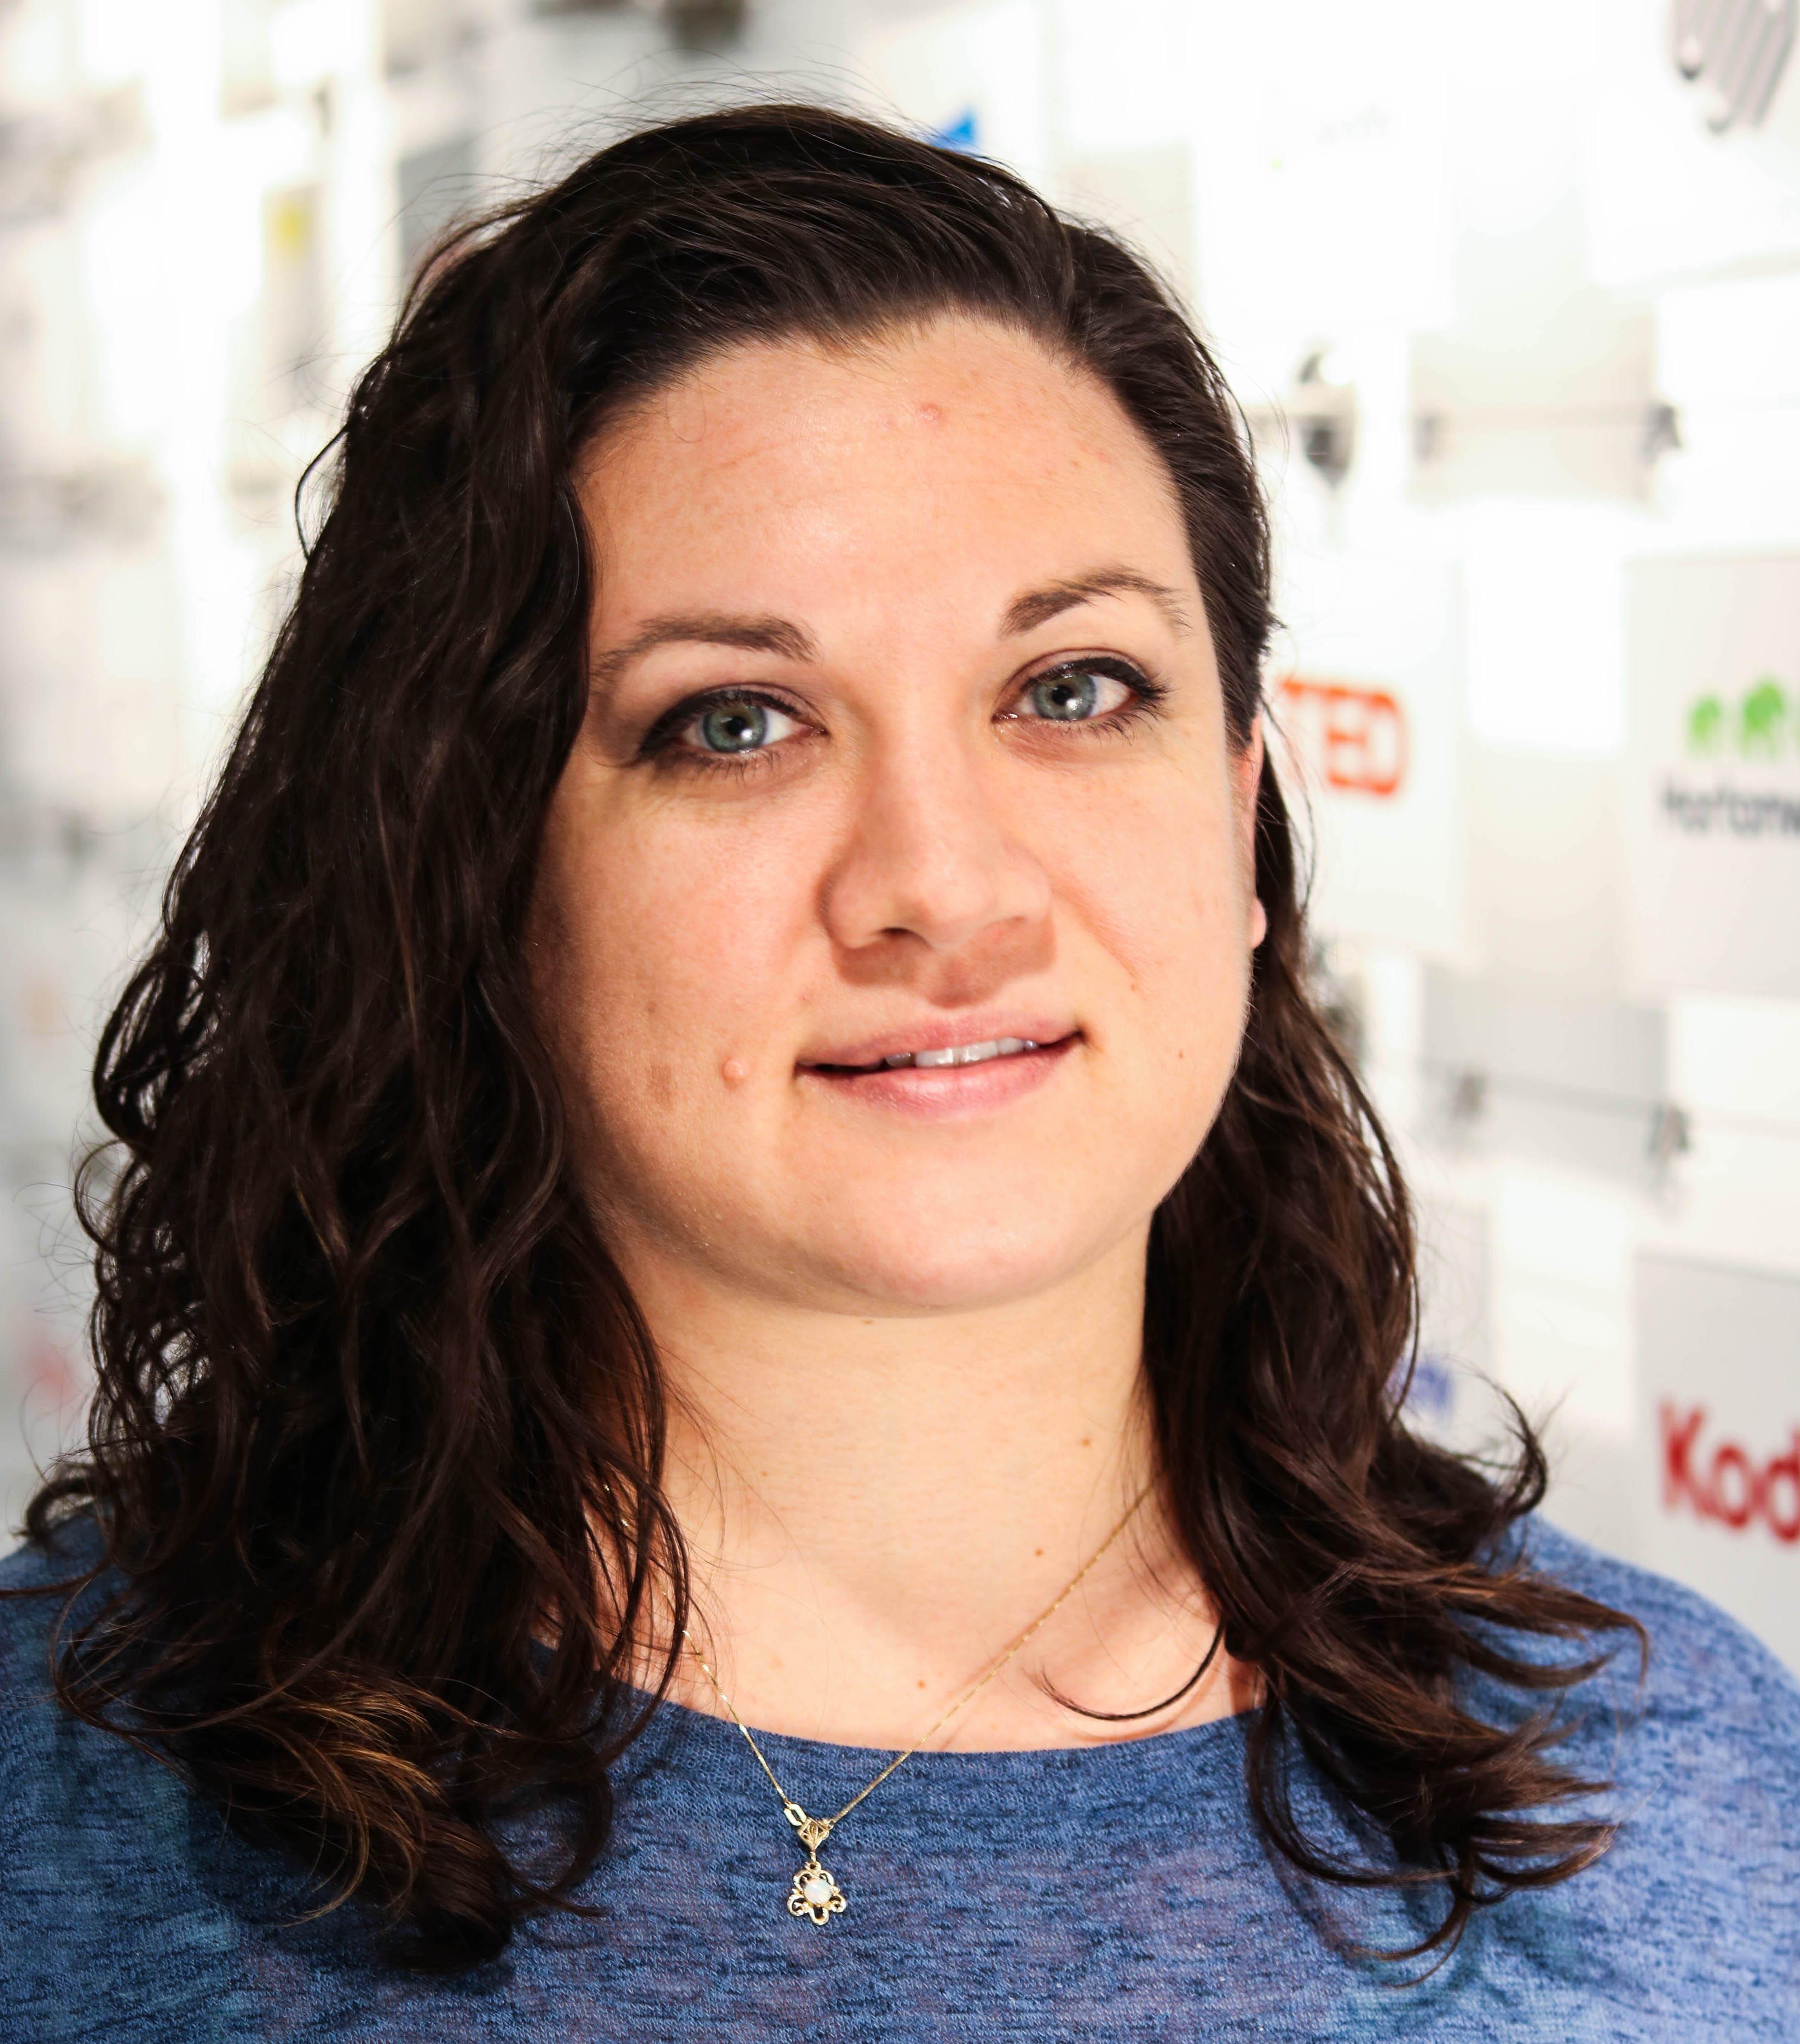 Melia Jones